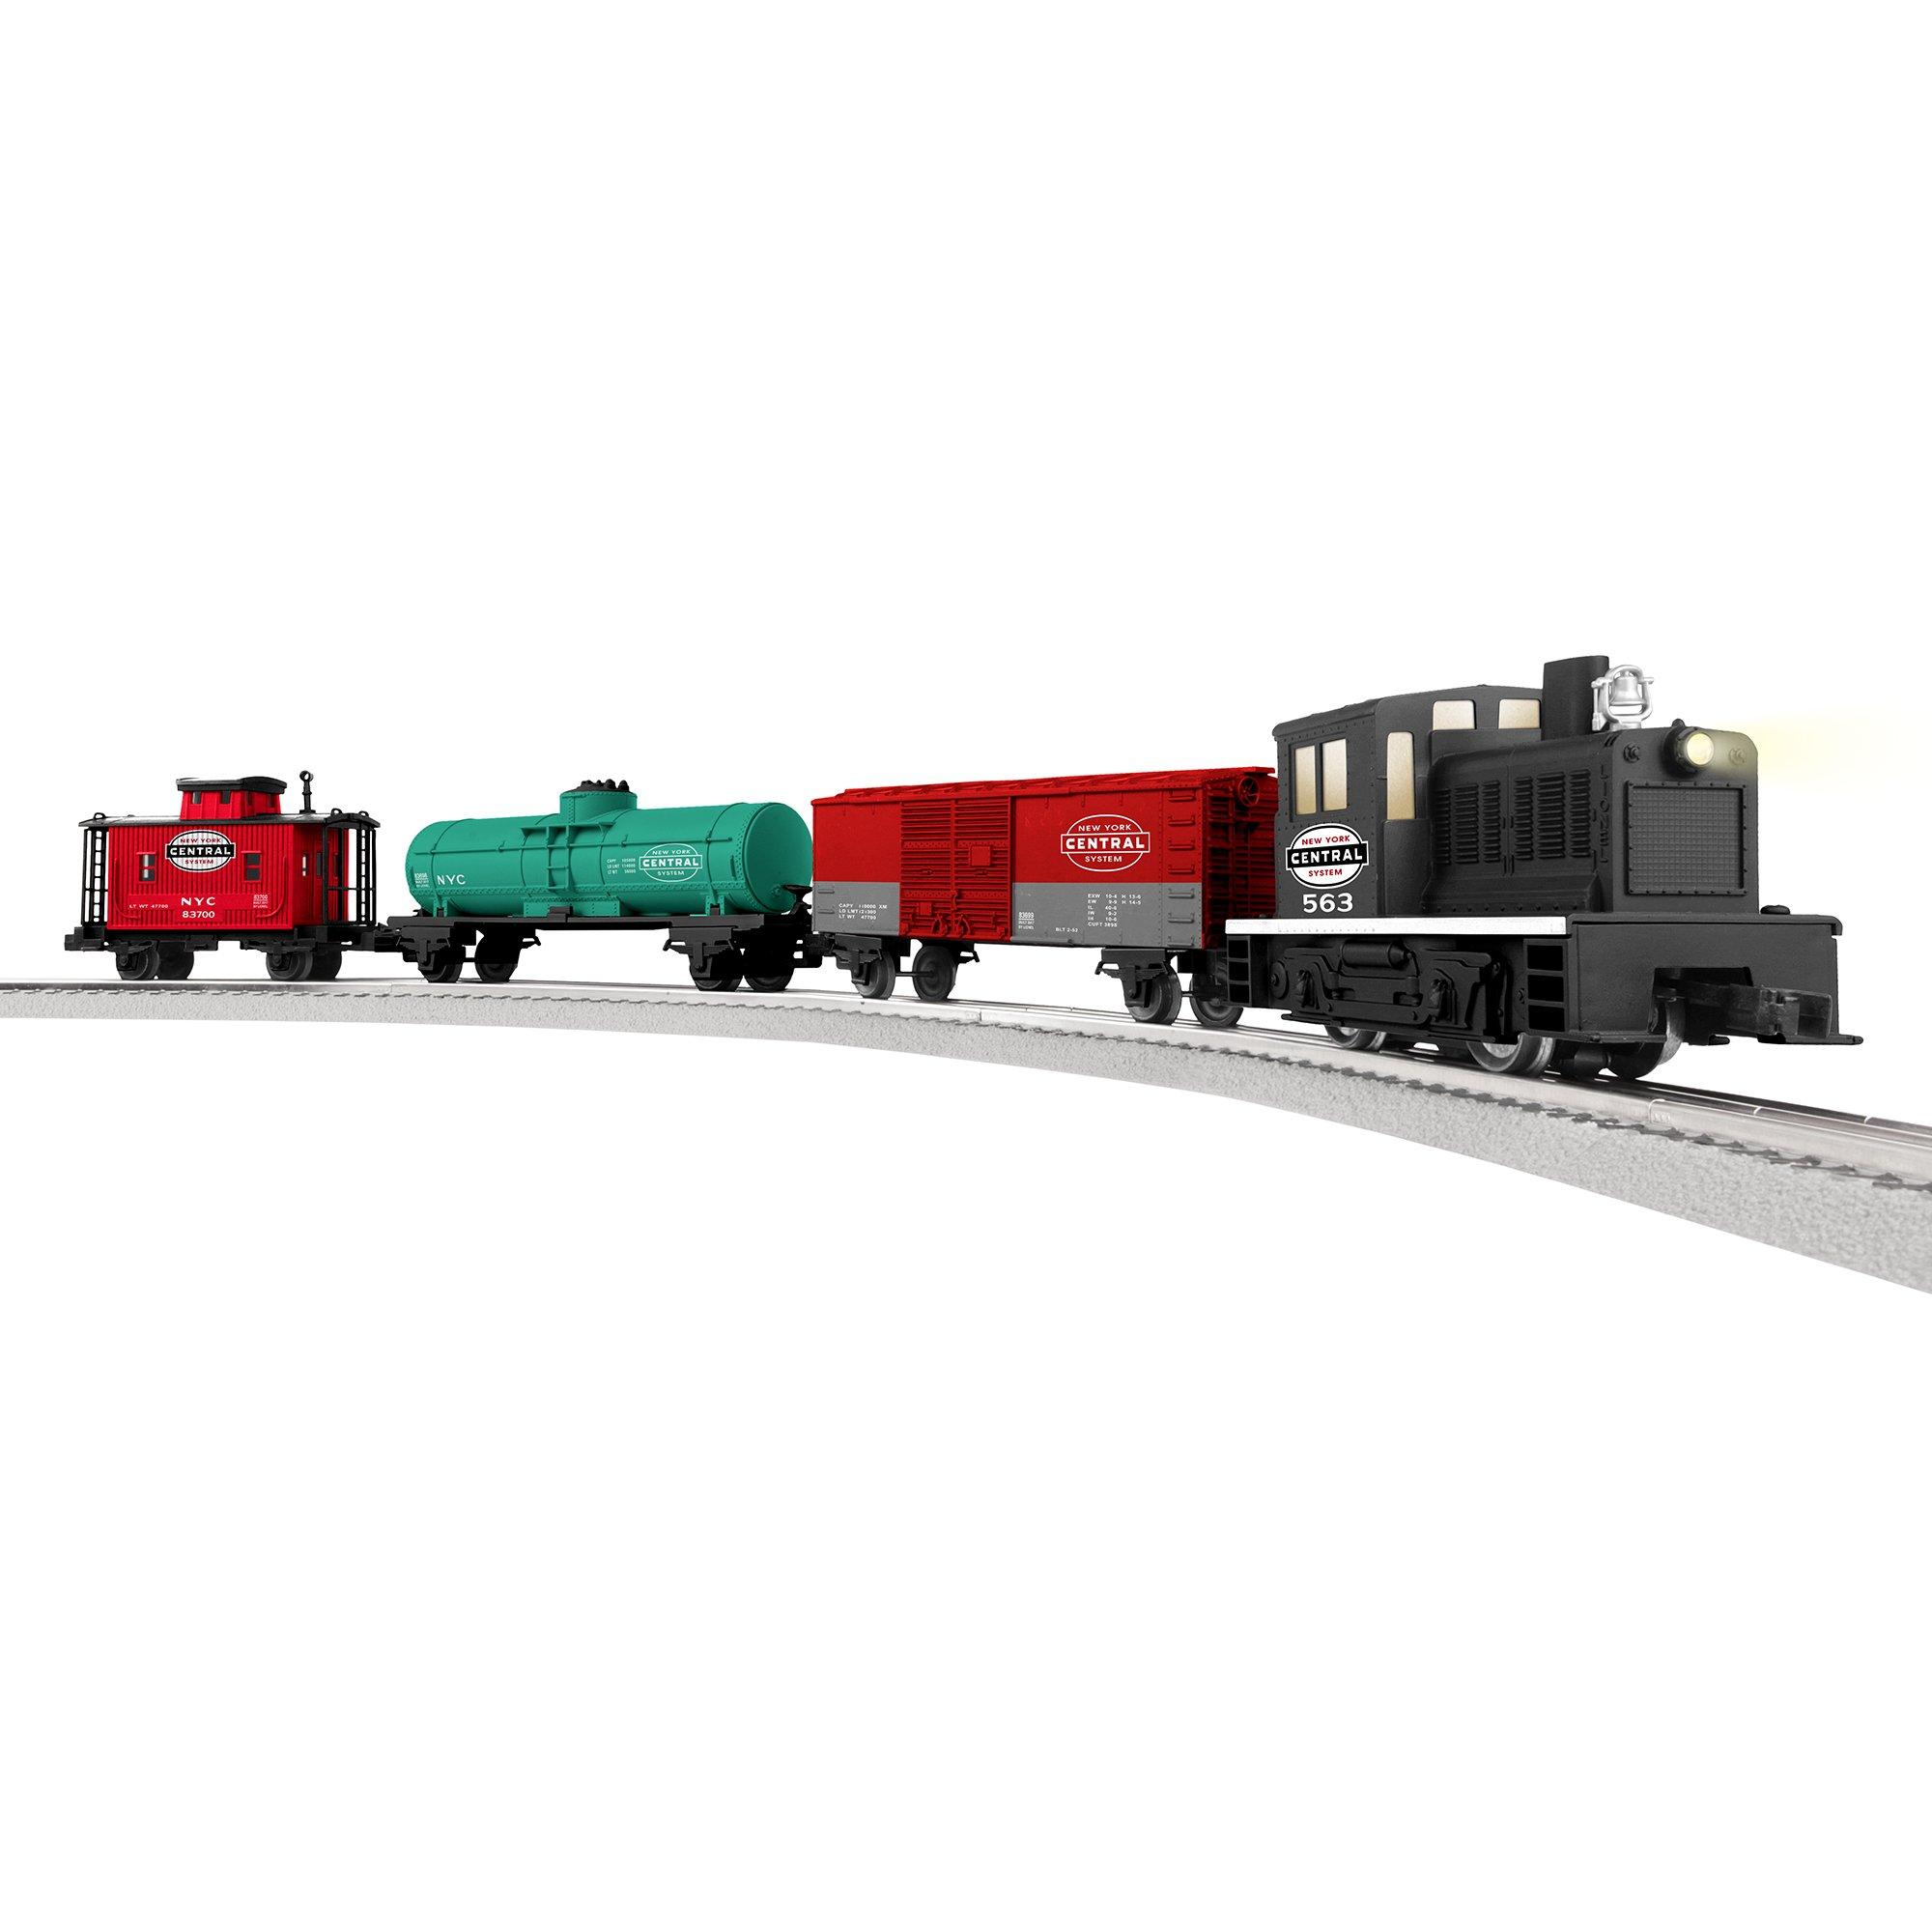 Lionel Junction New York Central Pacemaker Train Set